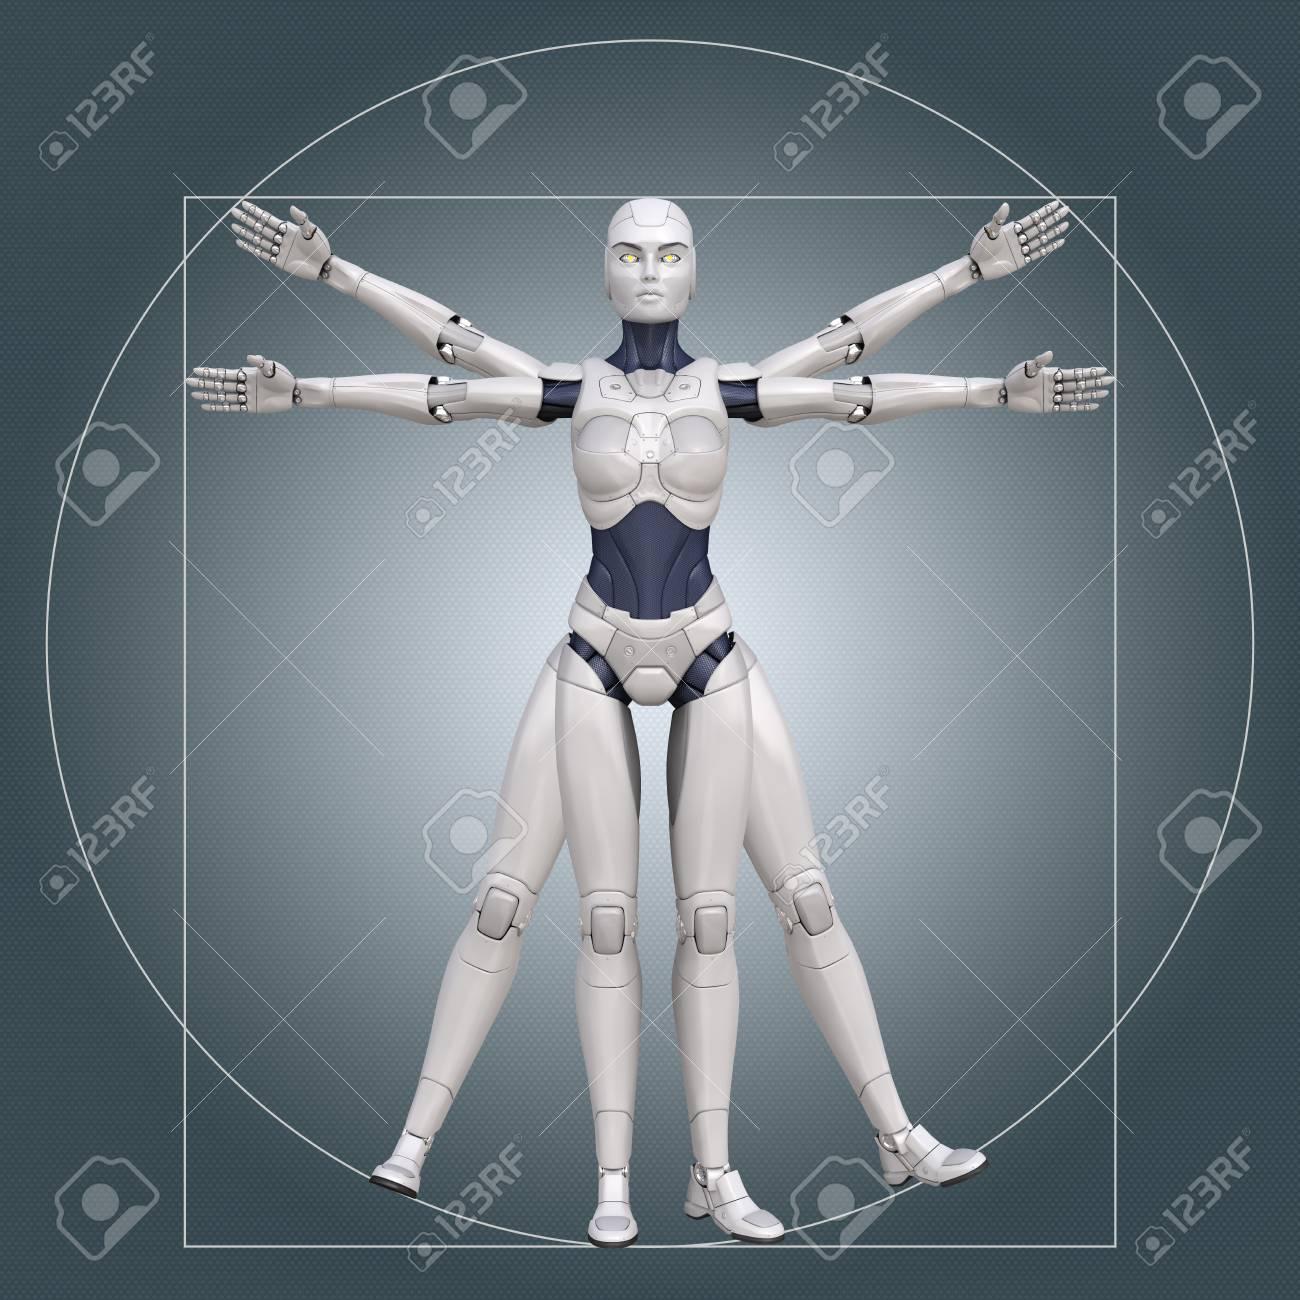 Vitruvian man, cyborg. 3D illustration - 87015905